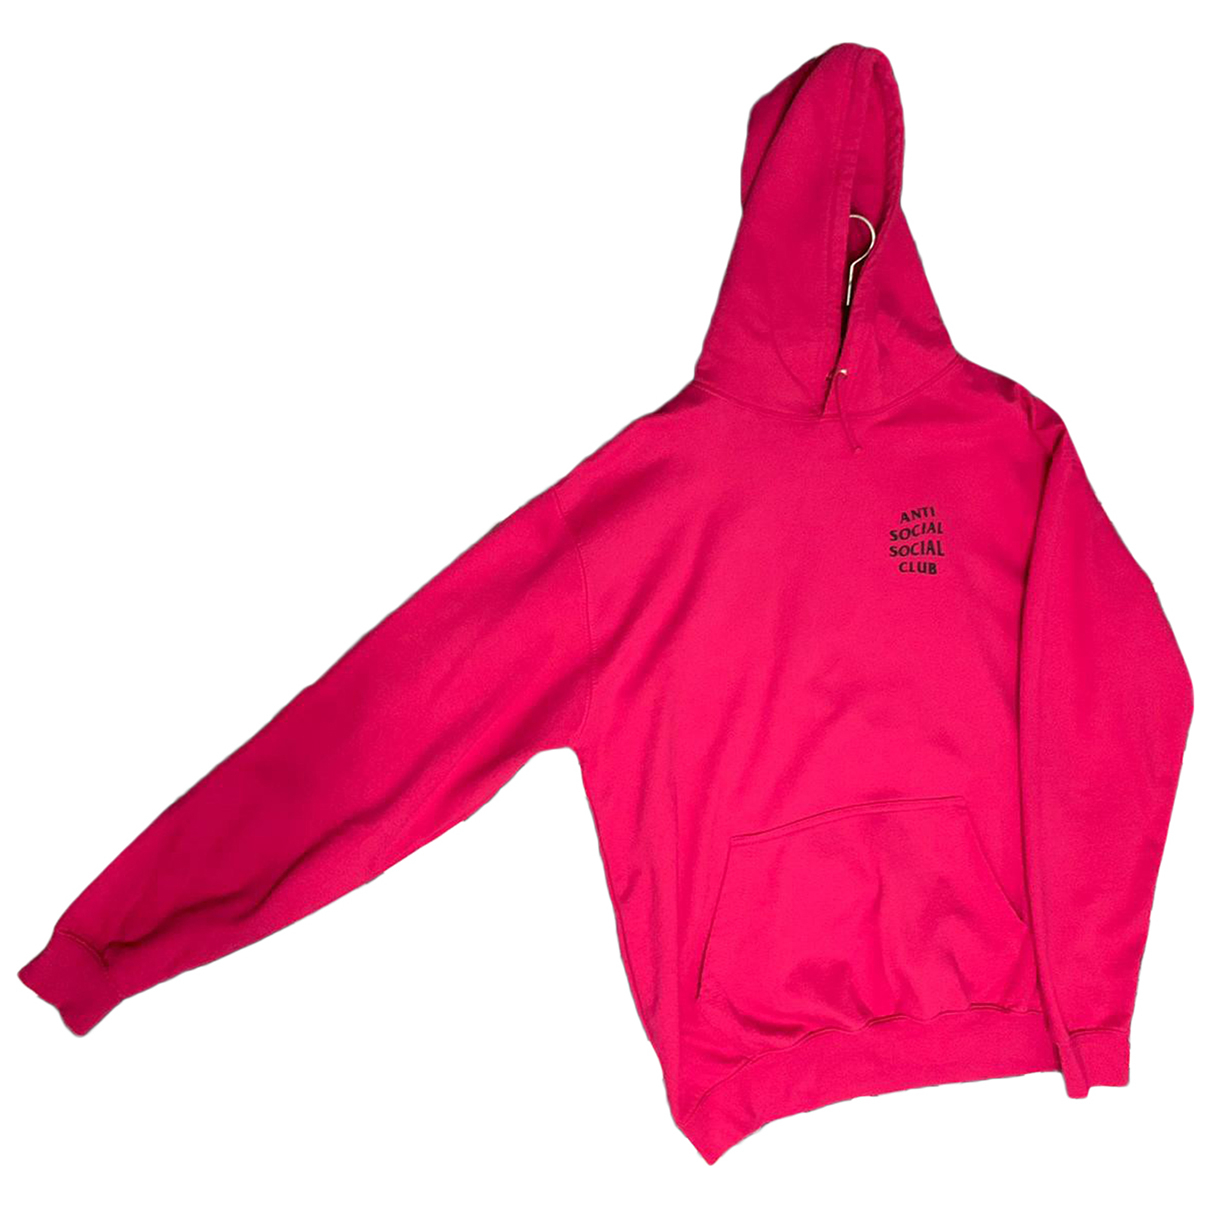 Anti Social Social Club N Pink Cotton Knitwear & Sweatshirts for Men XL International